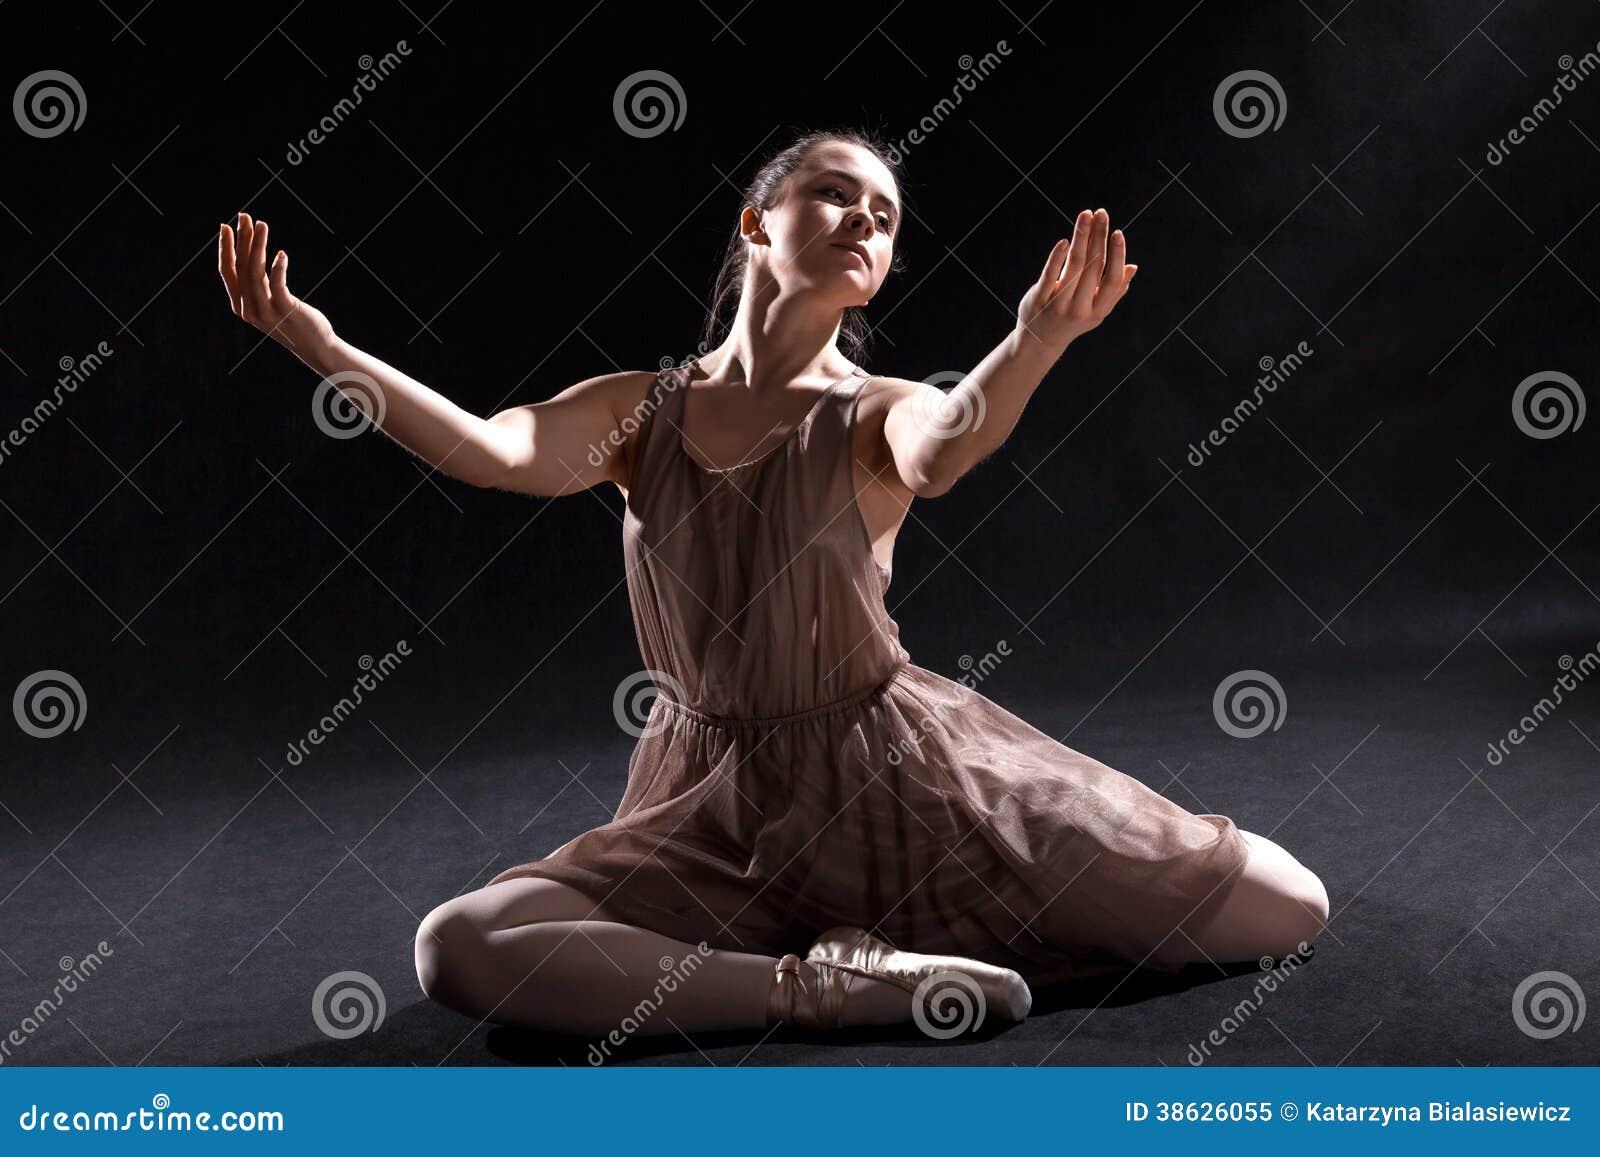 ballet dancers on stage - photo #38